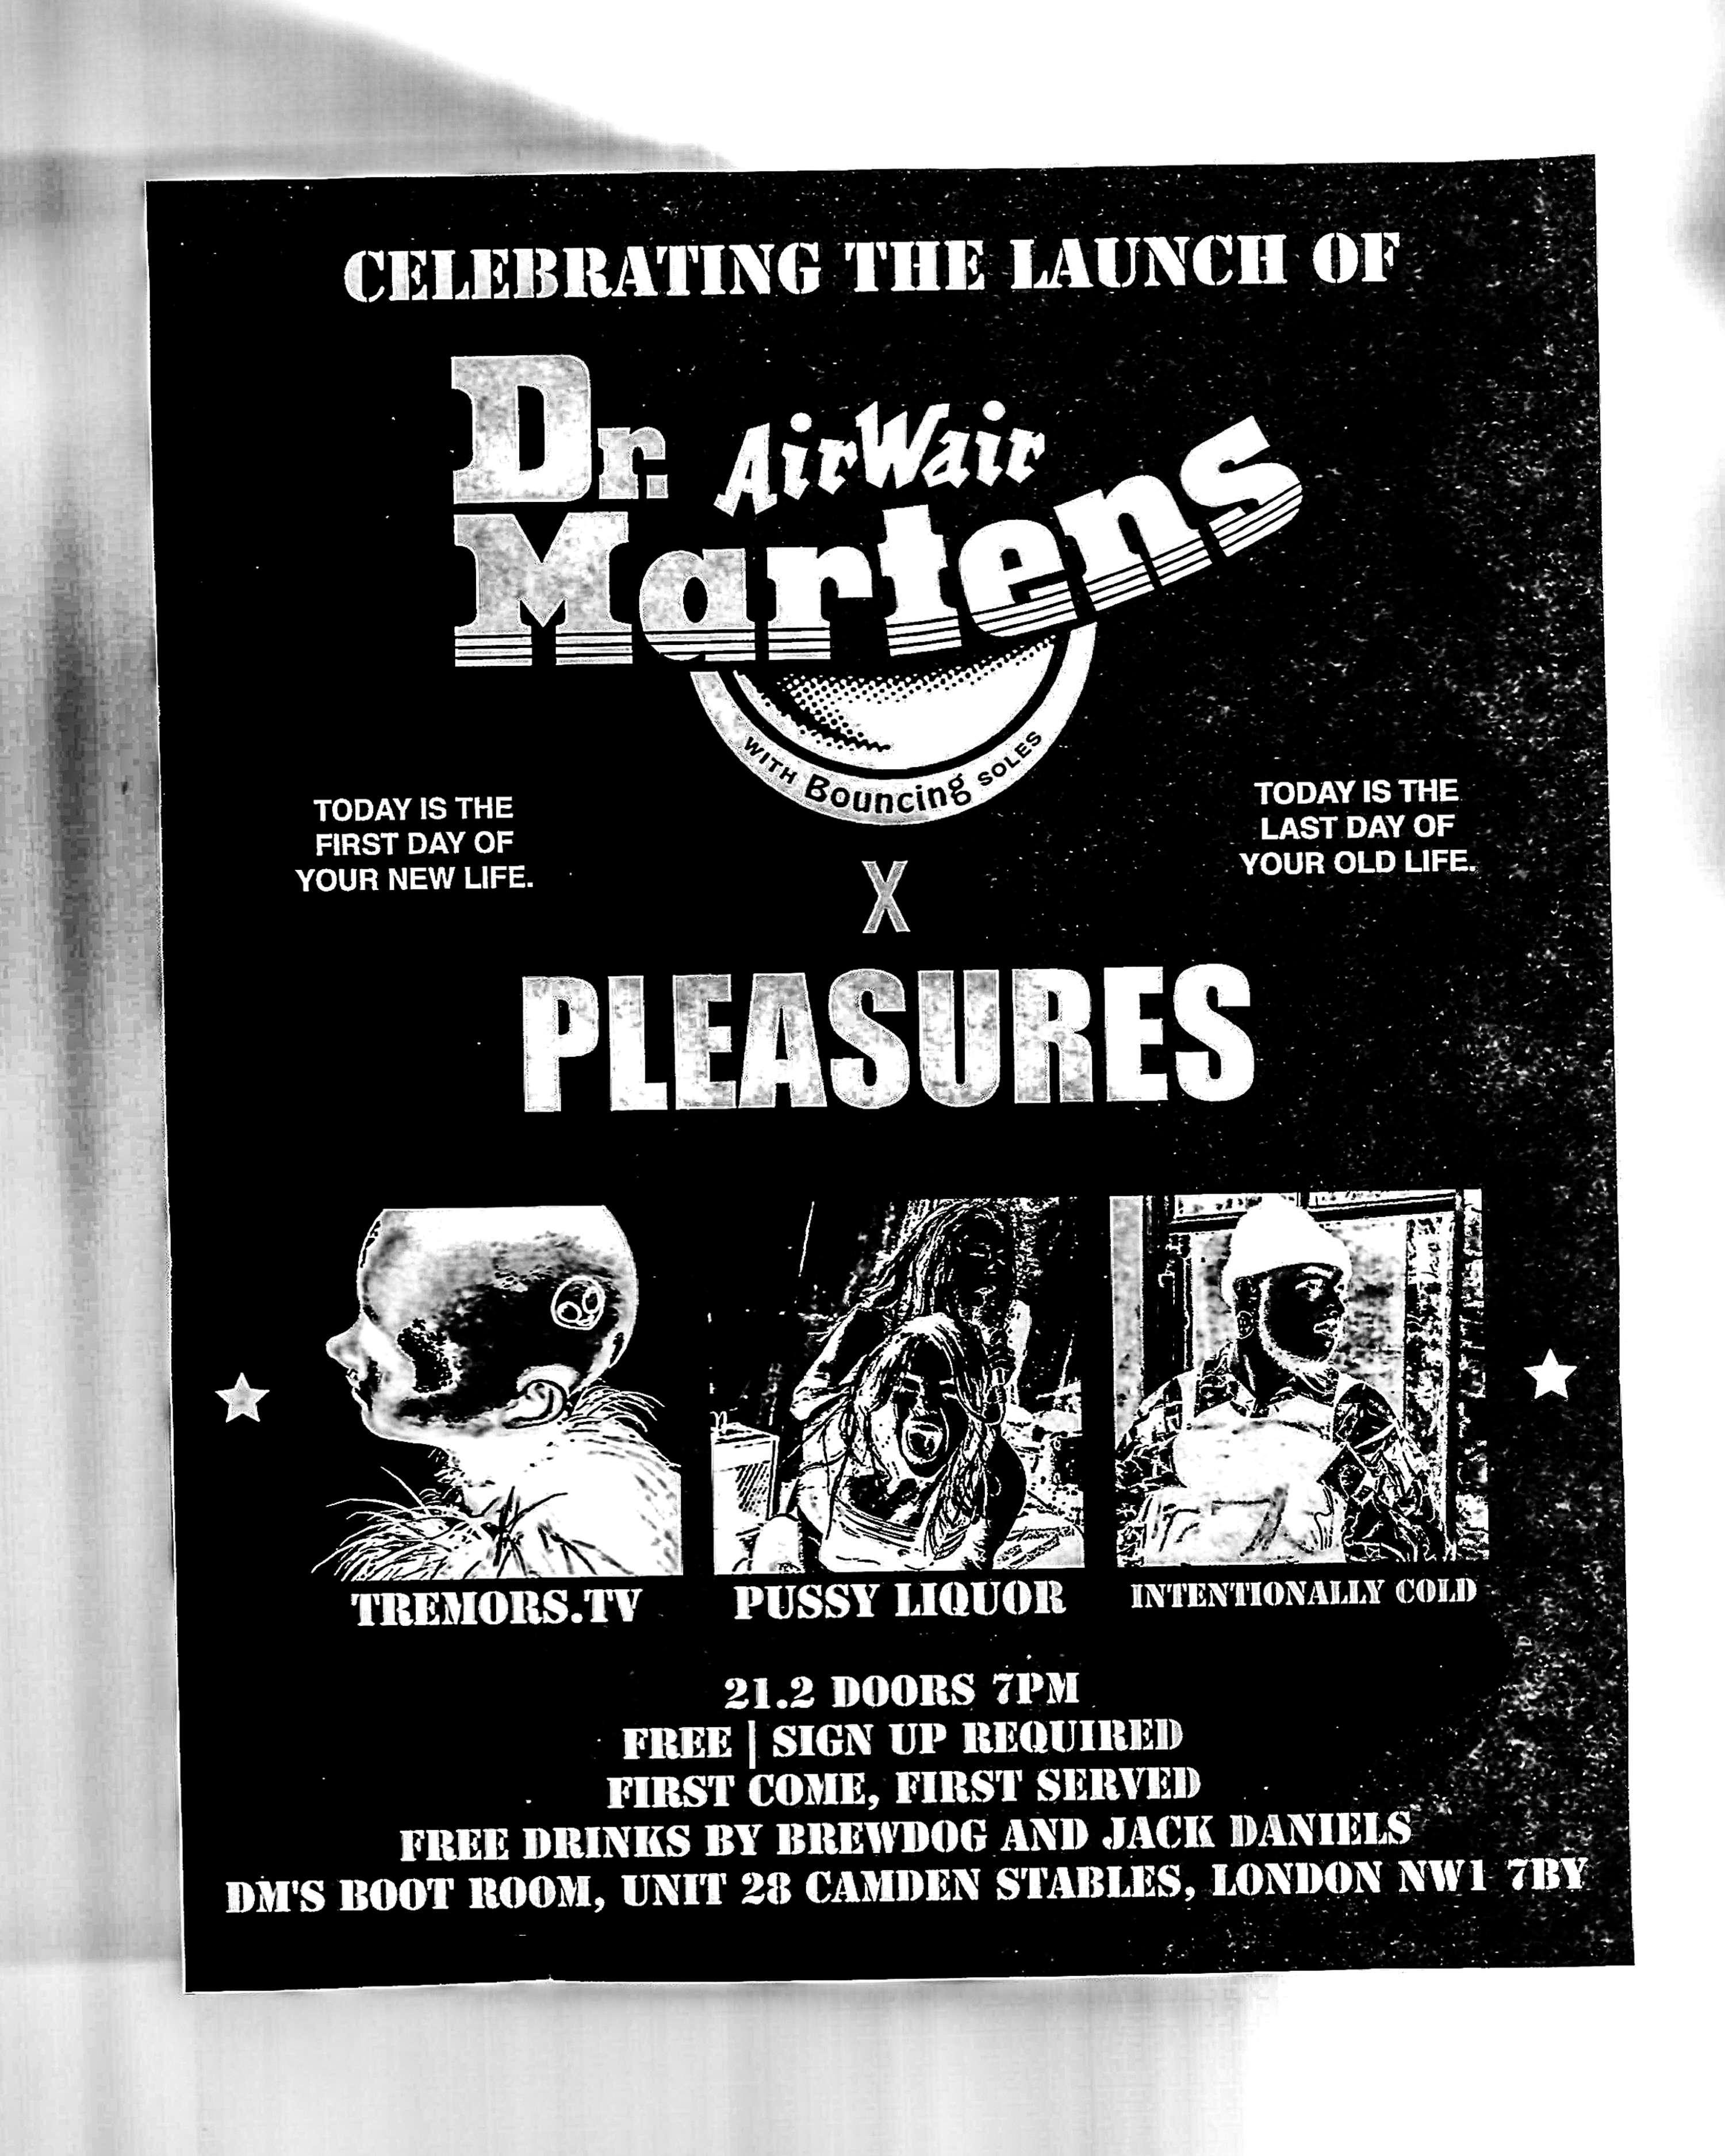 Dr Martens x Pleasures x Mixcloud | The Dots